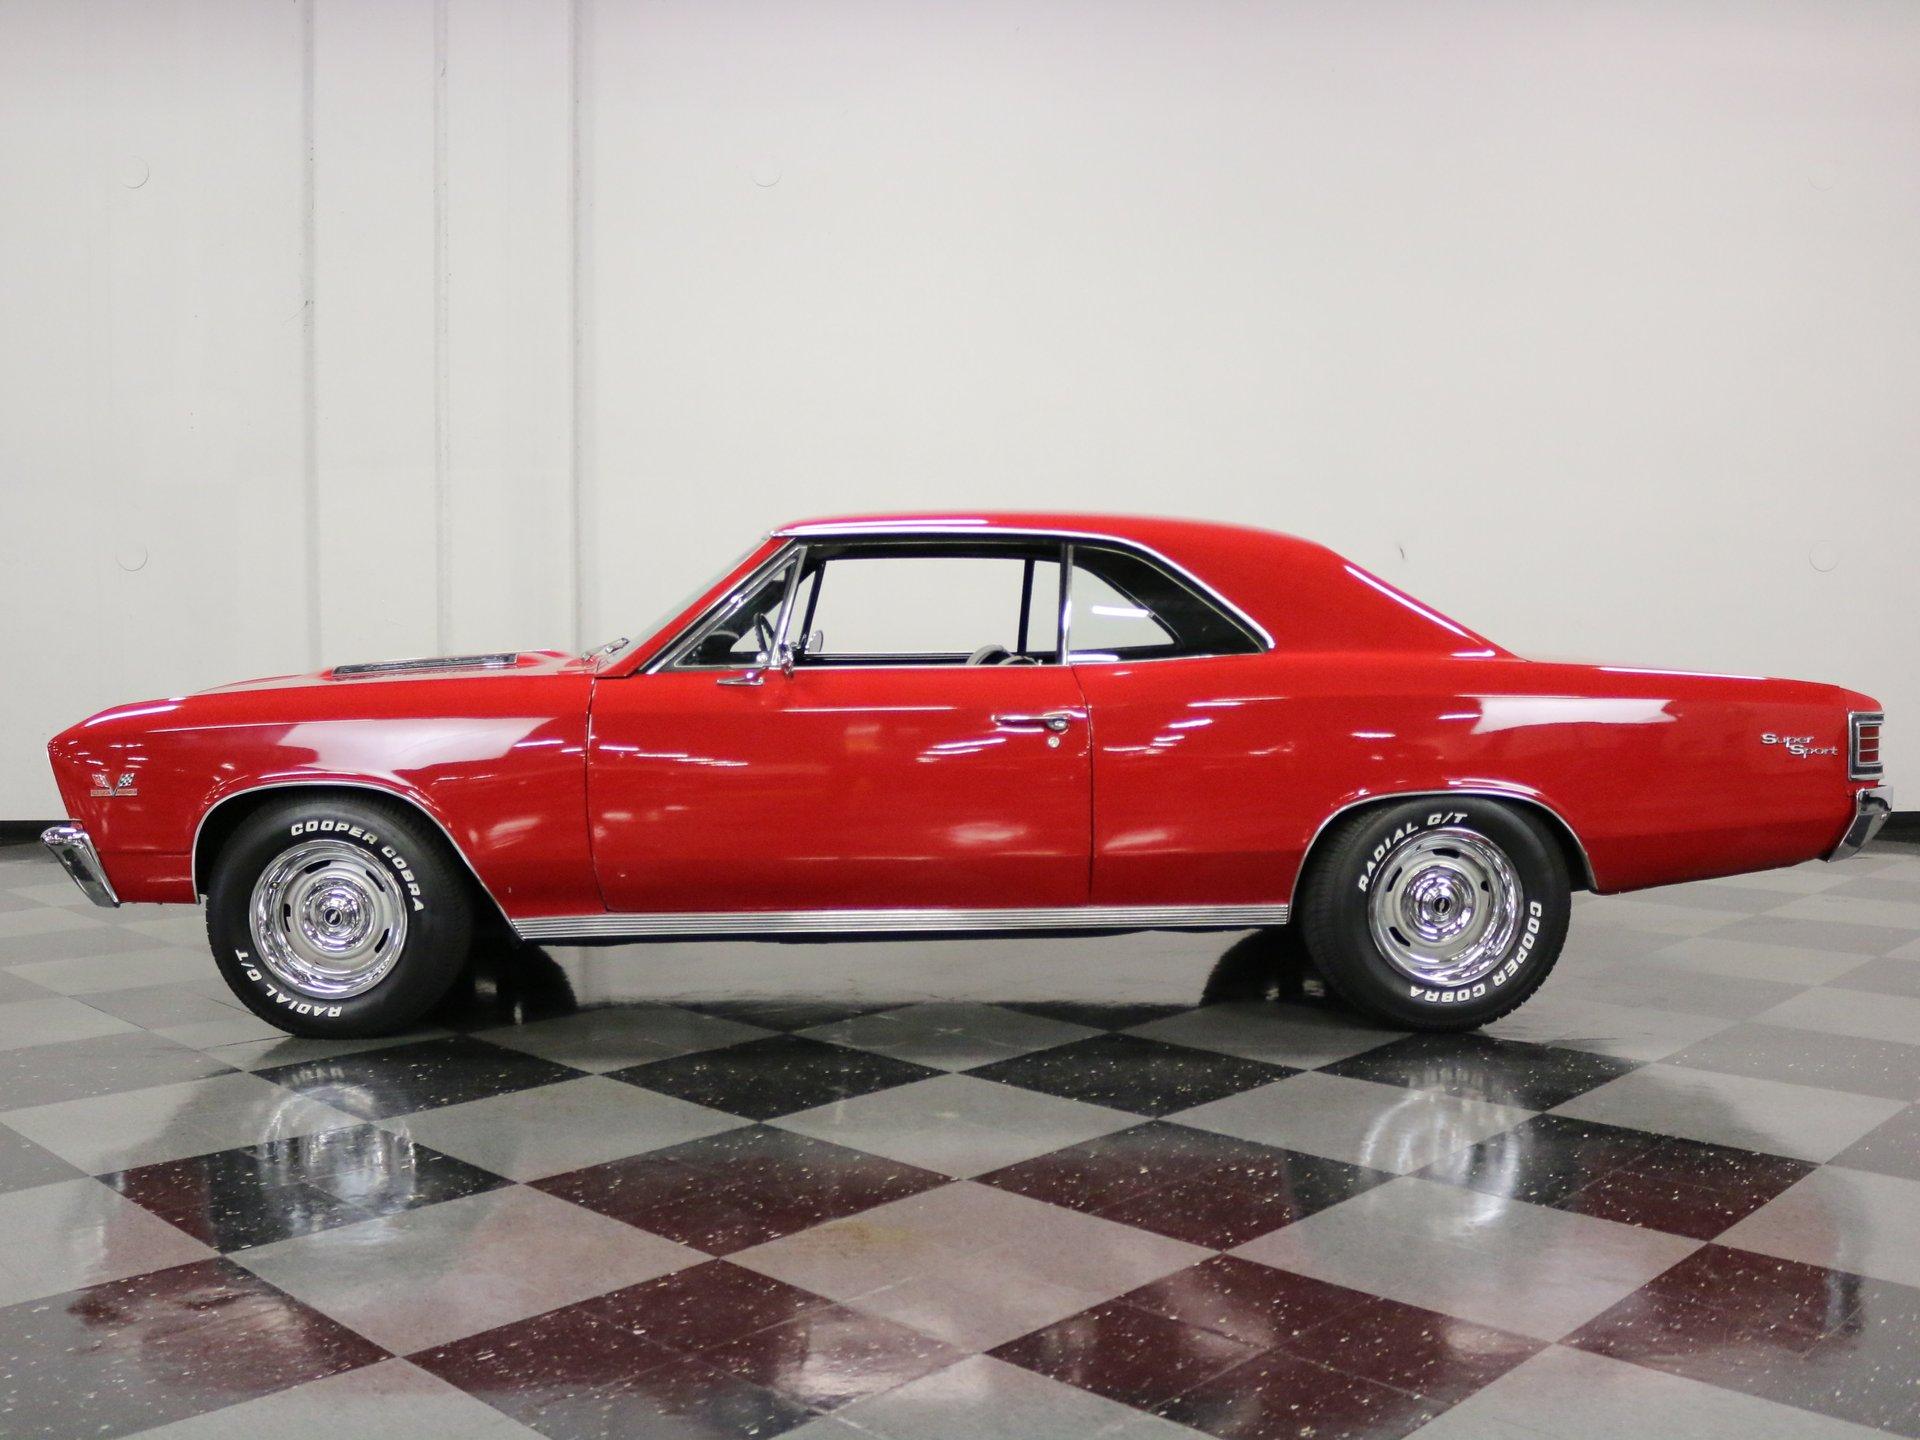 1967 chevrolet chevelle ss 427 tribute